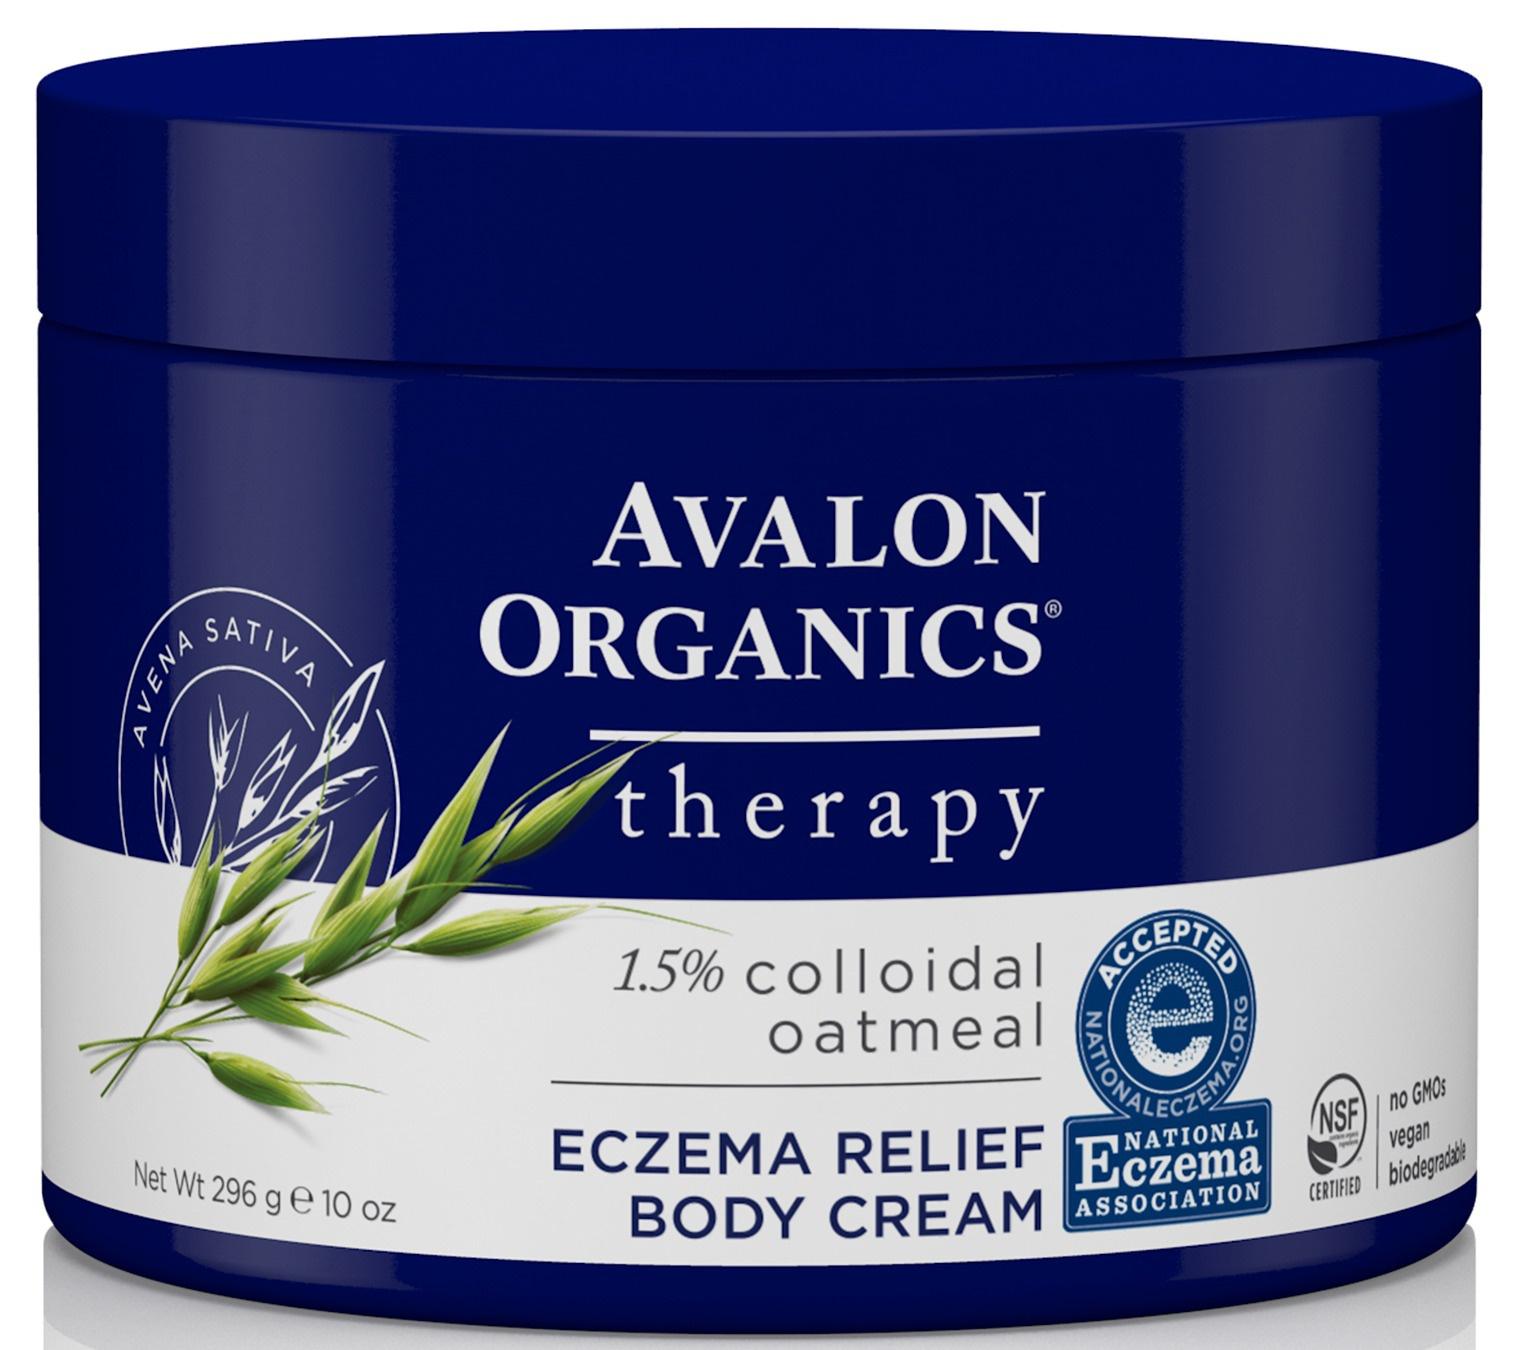 Avalon Organics Eczema Relief Body Cream